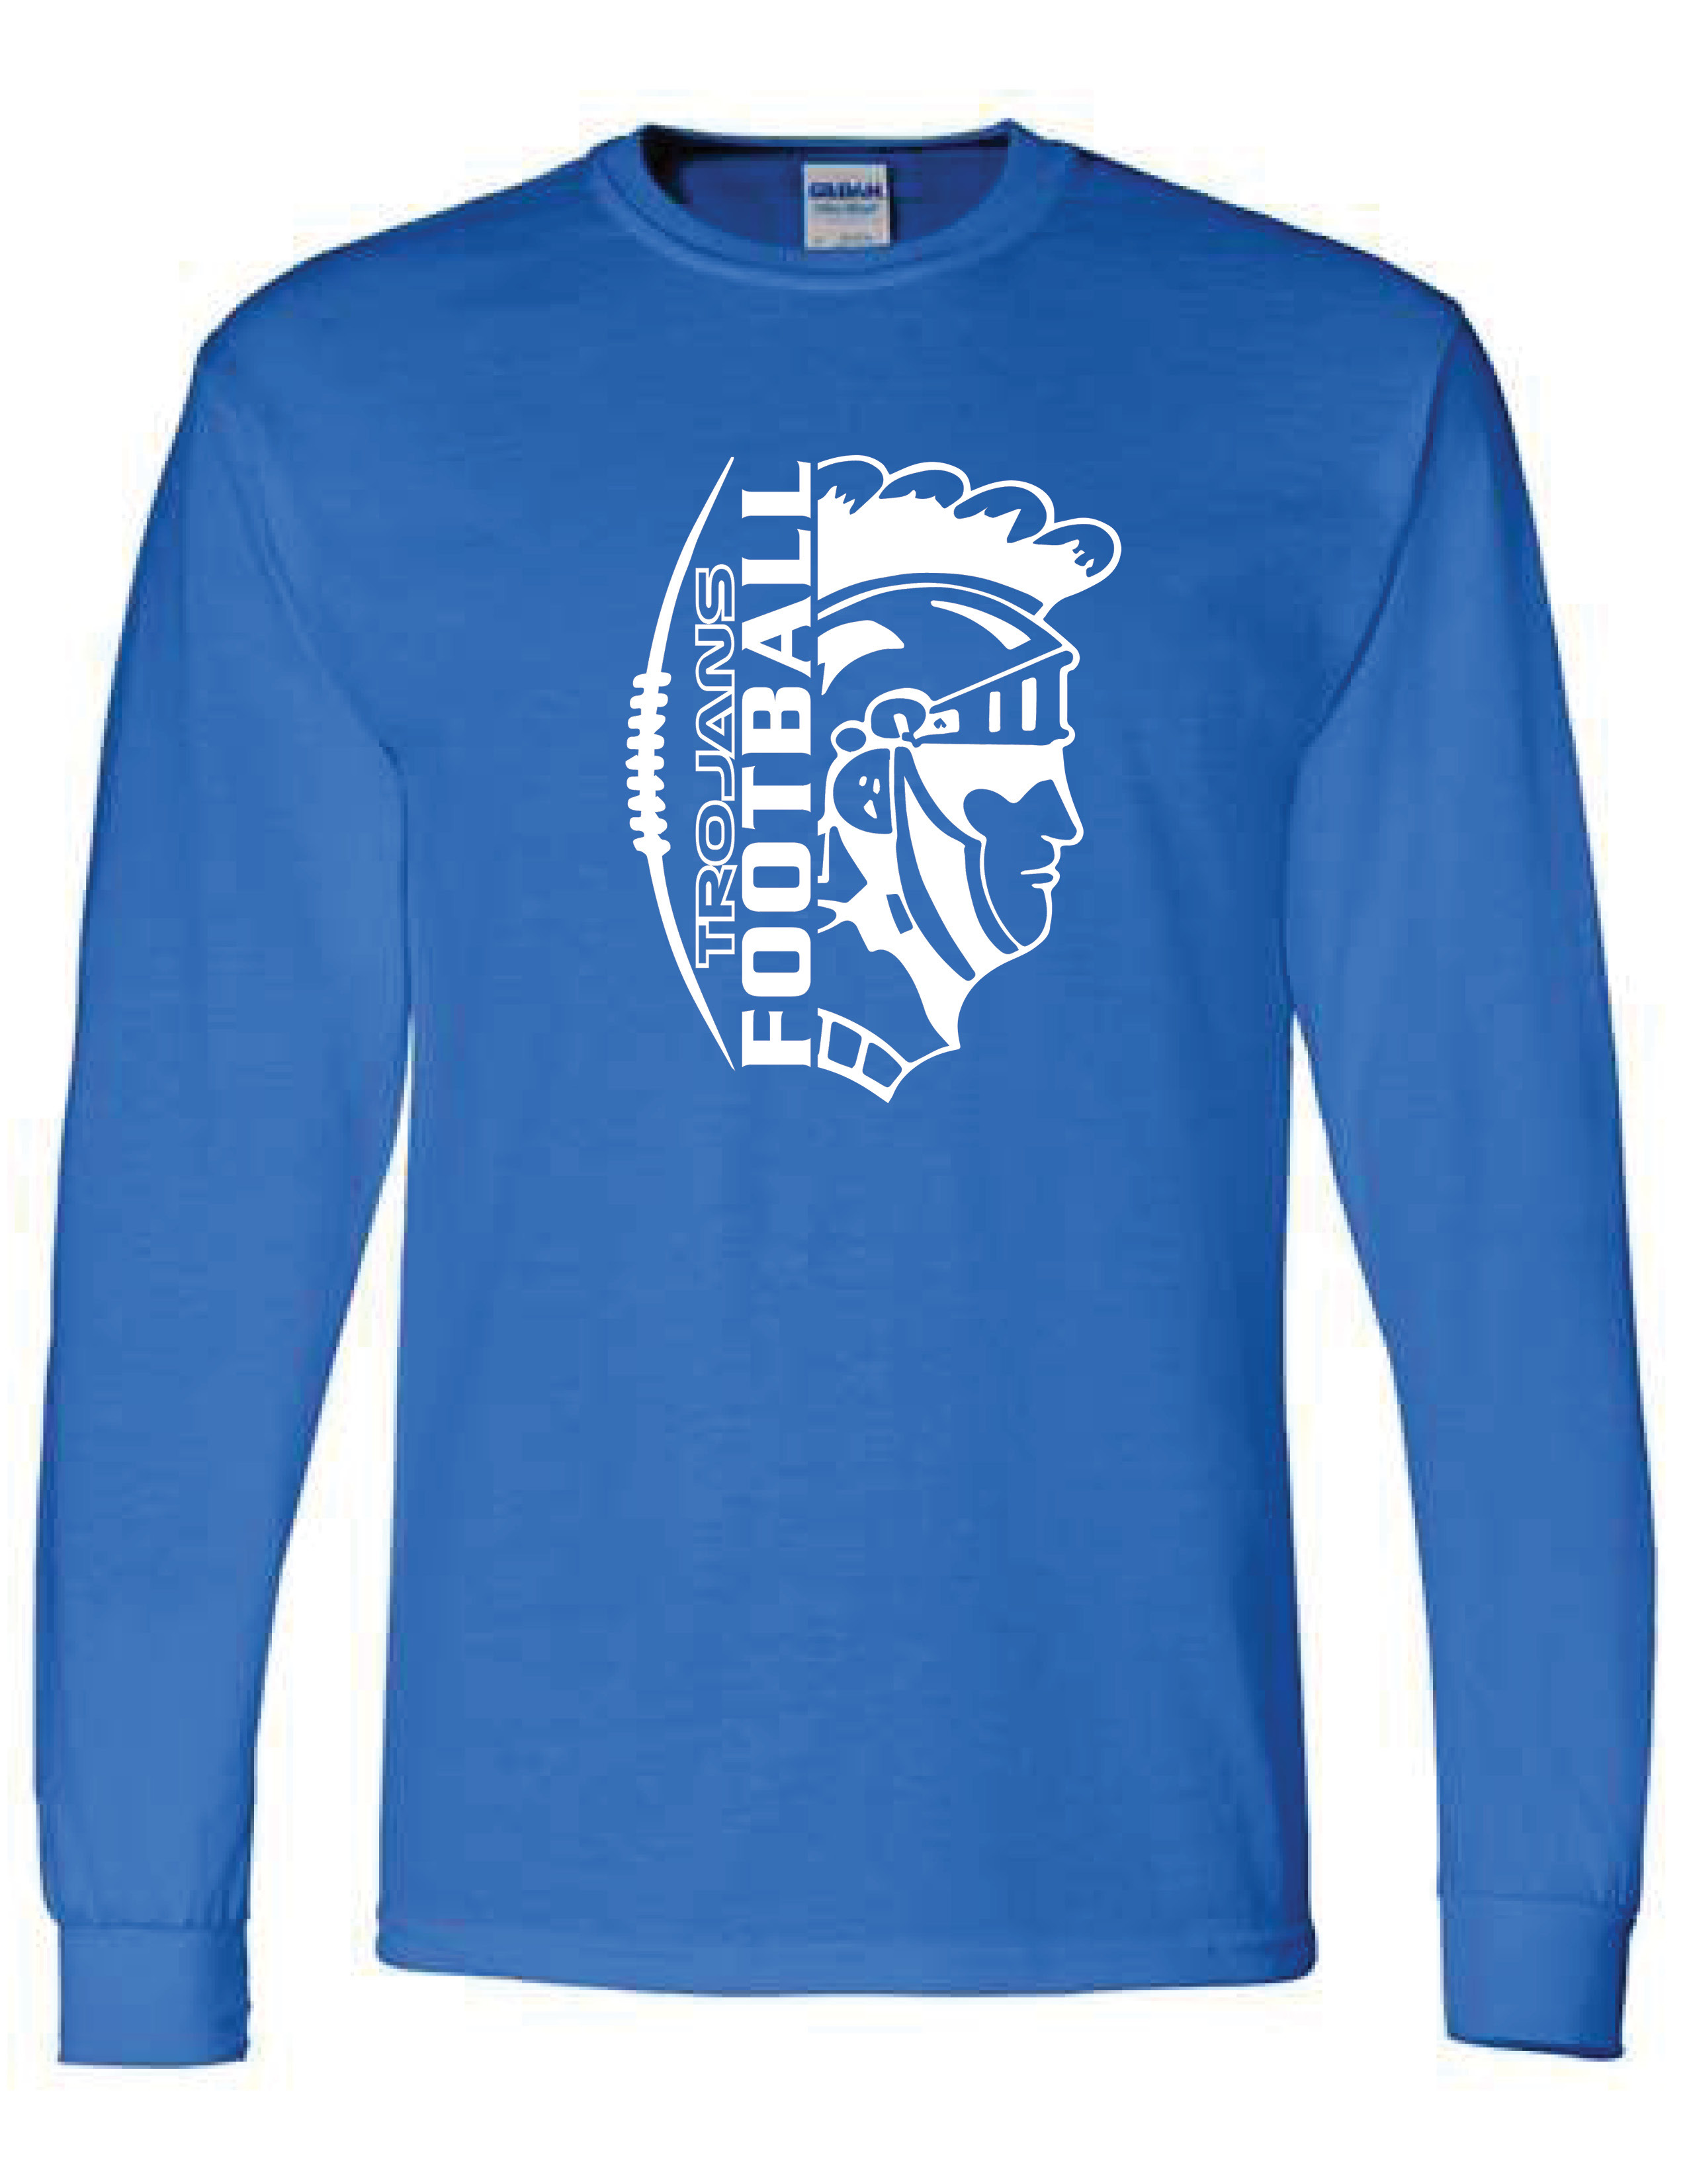 Long Sleeve T-shirt  (TROJAN)